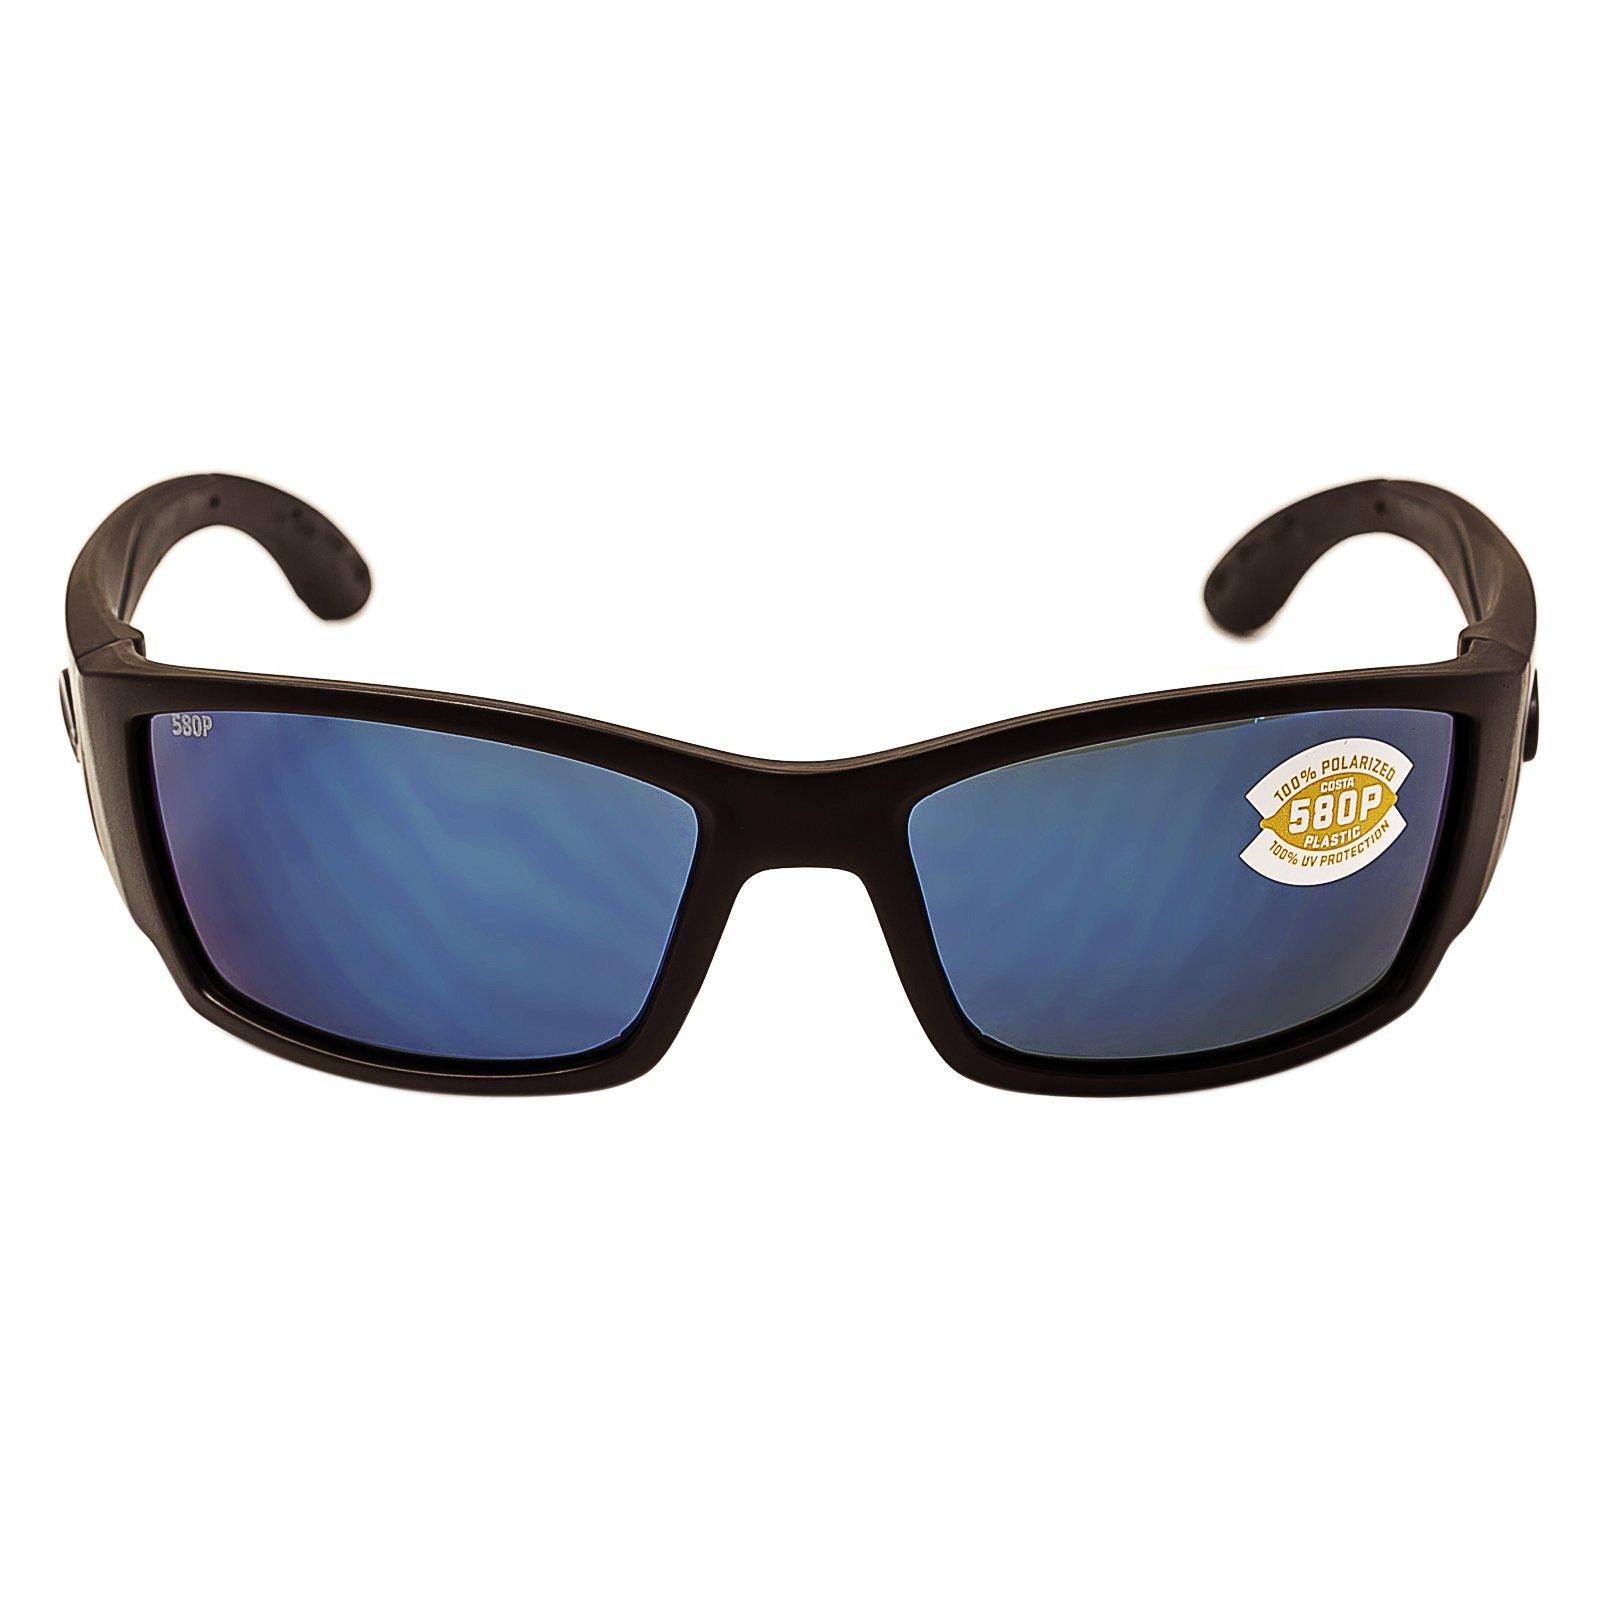 Costa Del Mar Corbina Sunglasses, Blackout, Blue Mirror 580Plastic Lens by Costa Del Mar